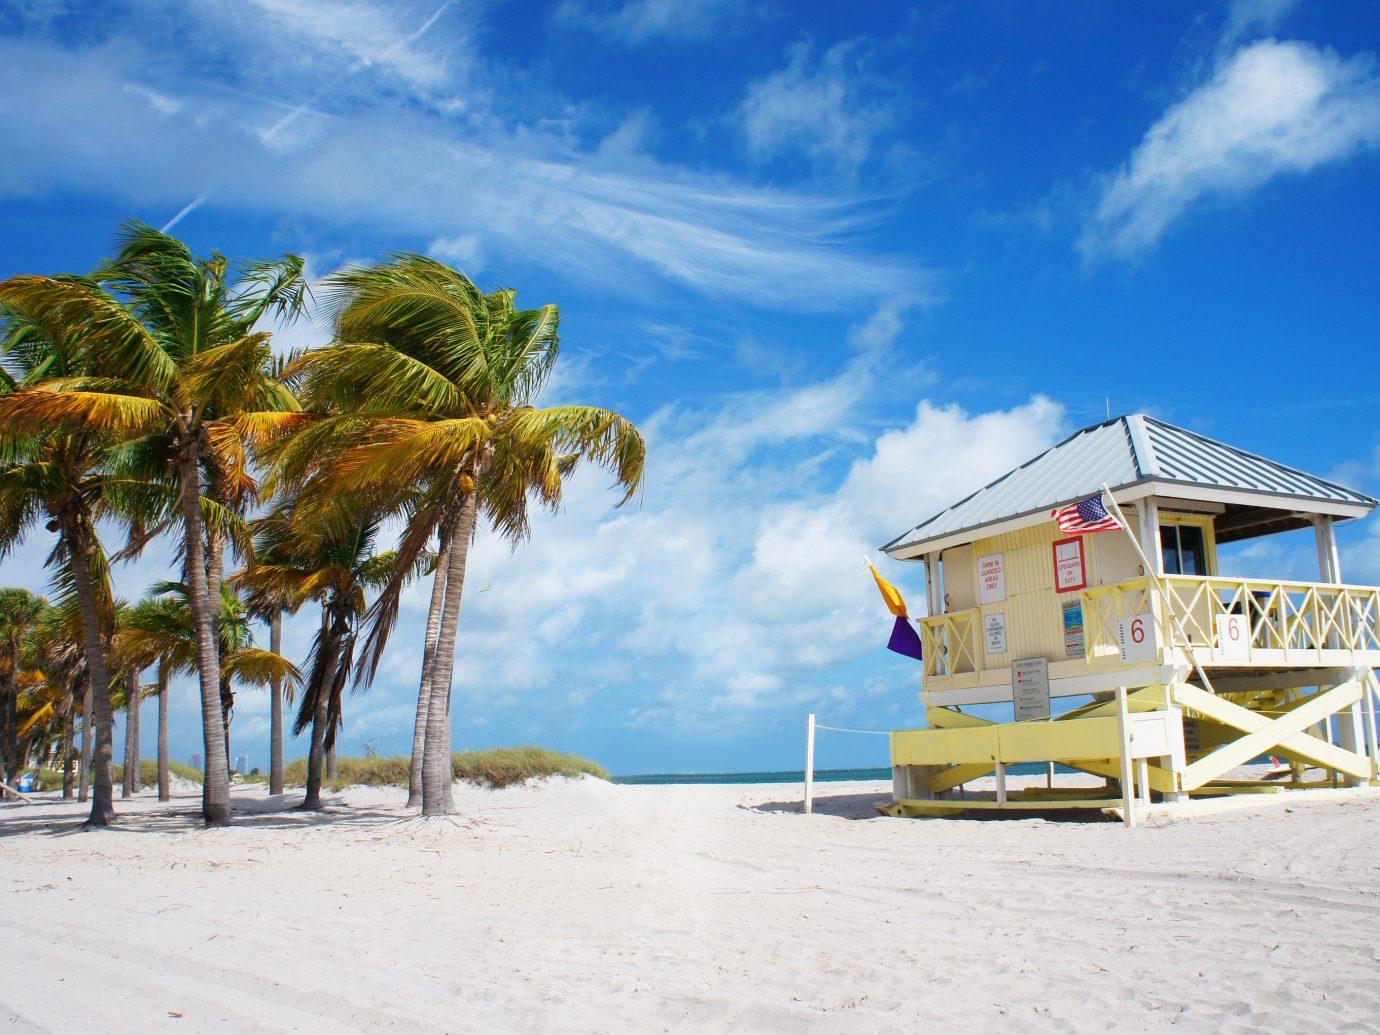 America Trip Ideas Weekend Getaways sky outdoor Beach shore Sea body of water Ocean Coast vacation caribbean Resort Island bay vehicle arecales sandy sand tropics day